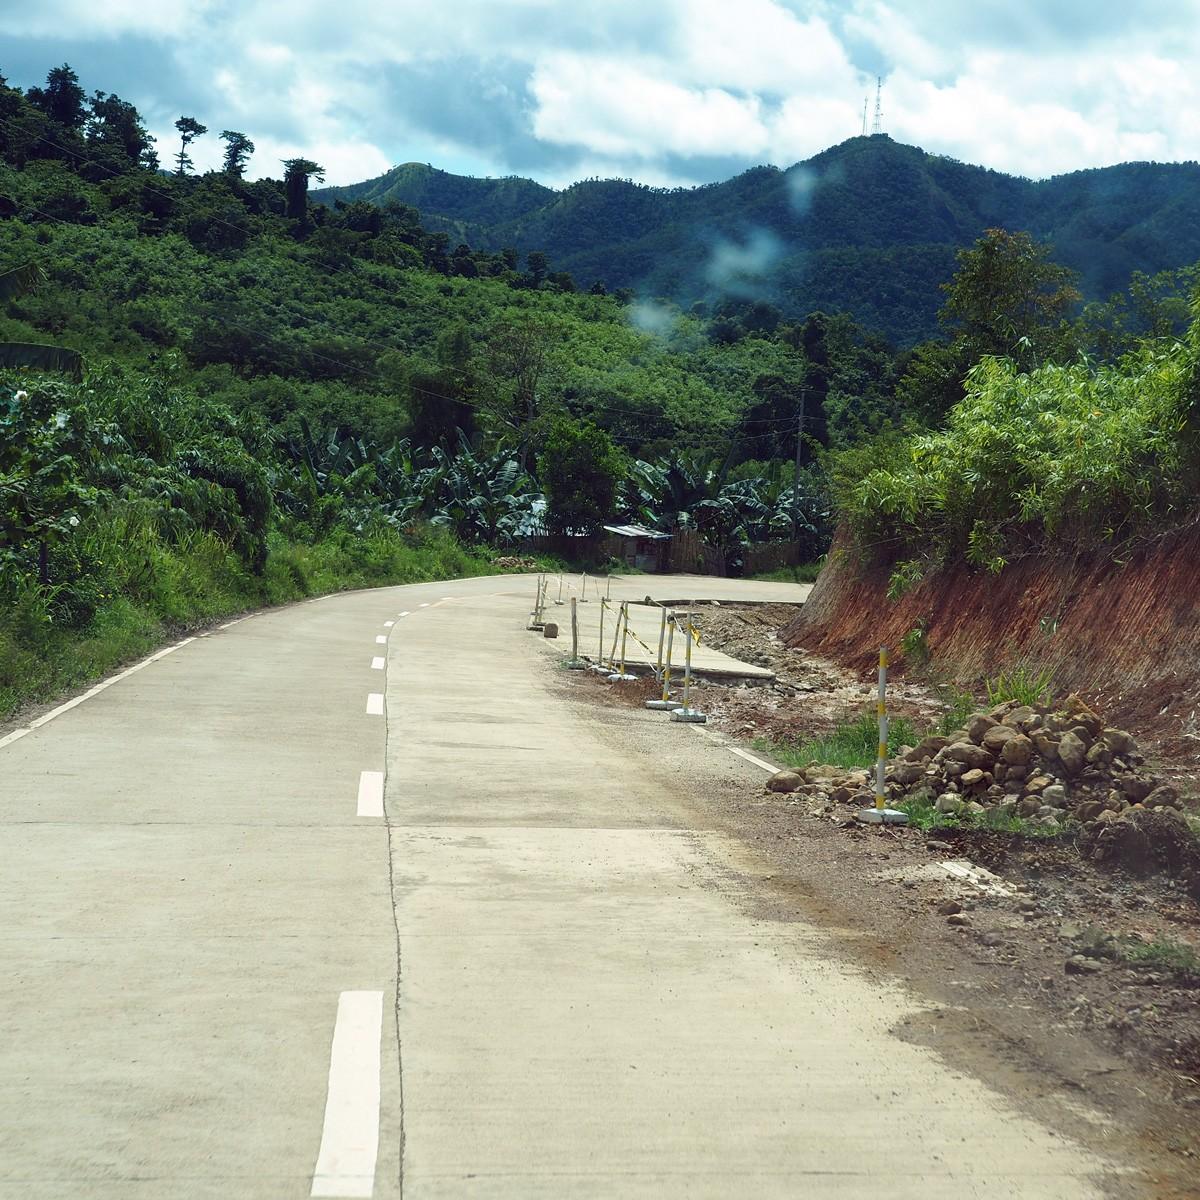 Busuanga airport - Coron Town transfer